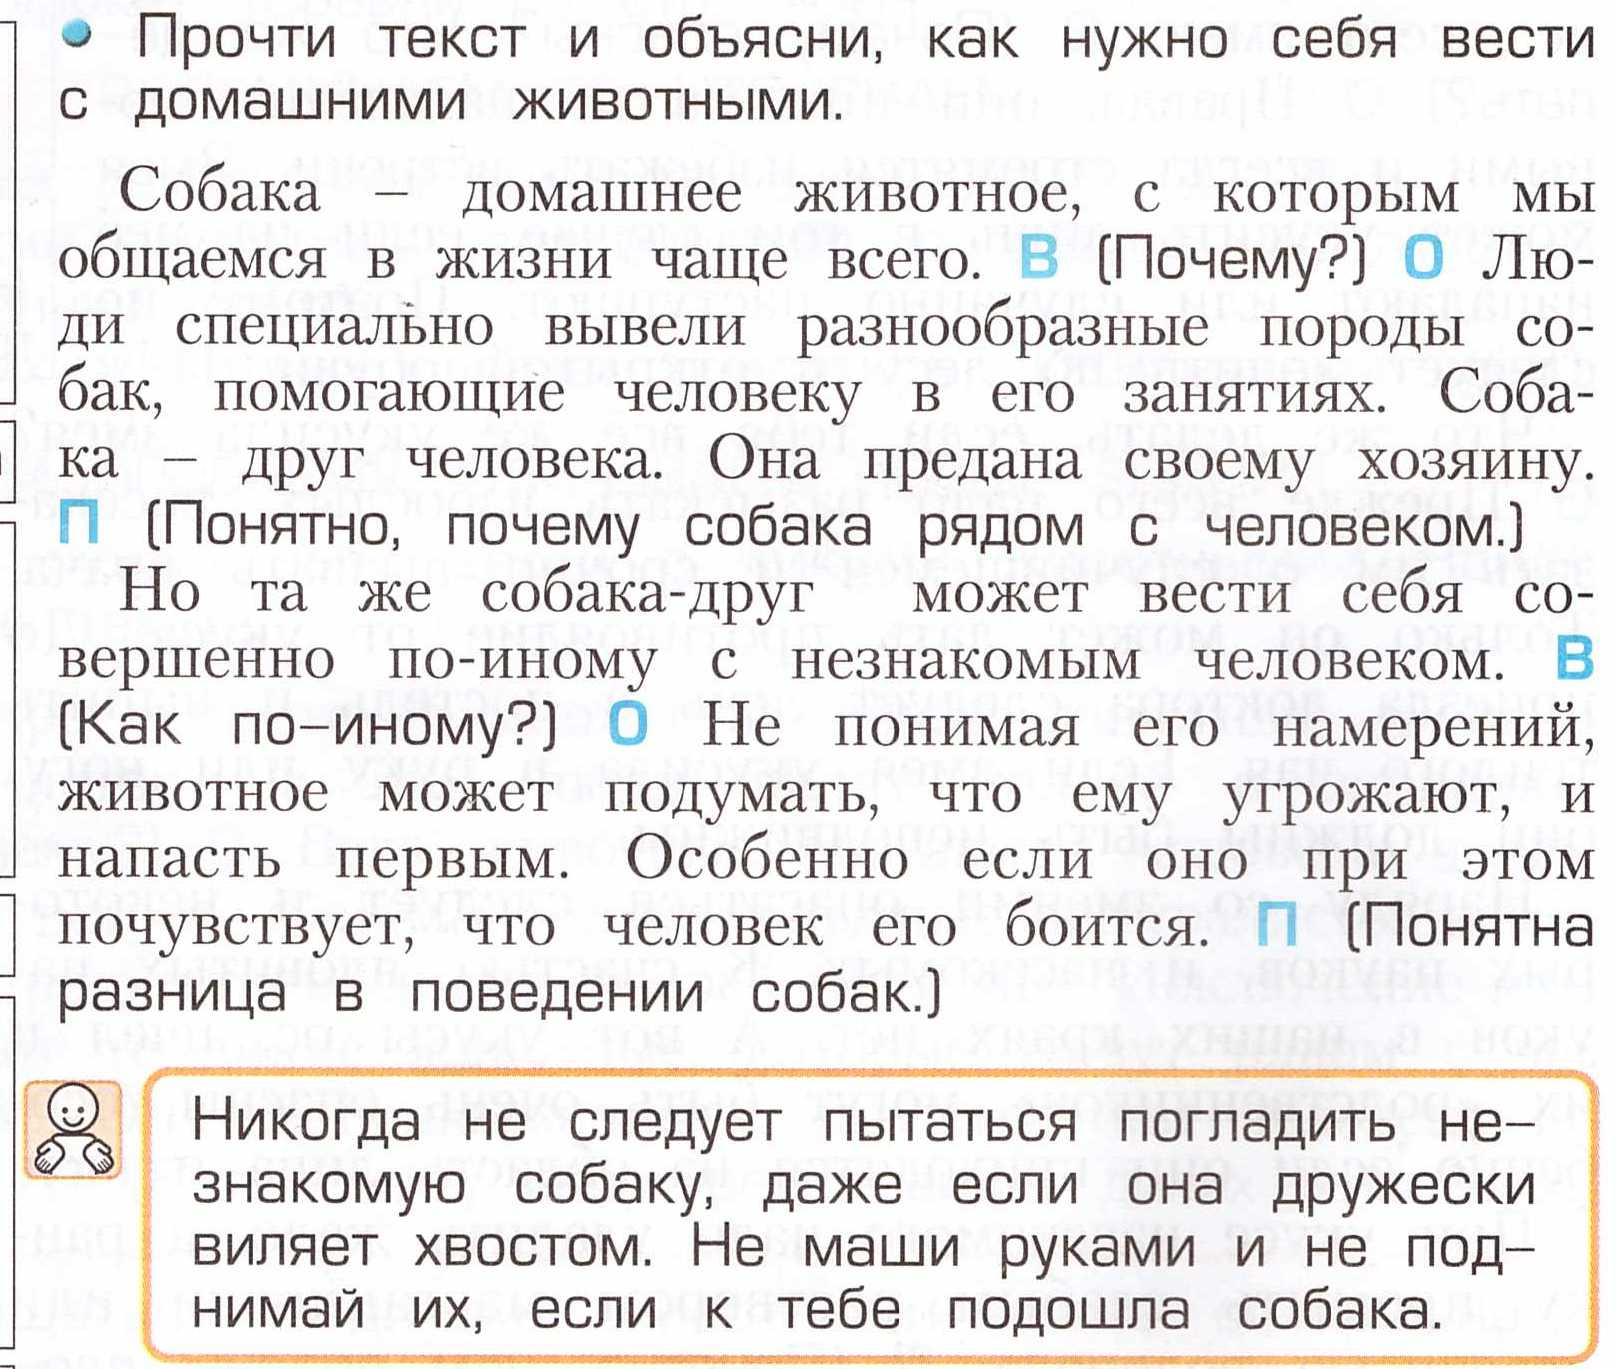 C:\Users\Наталья\AppData\Local\Microsoft\Windows\Temporary Internet Files\Content.Word\42.jpeg